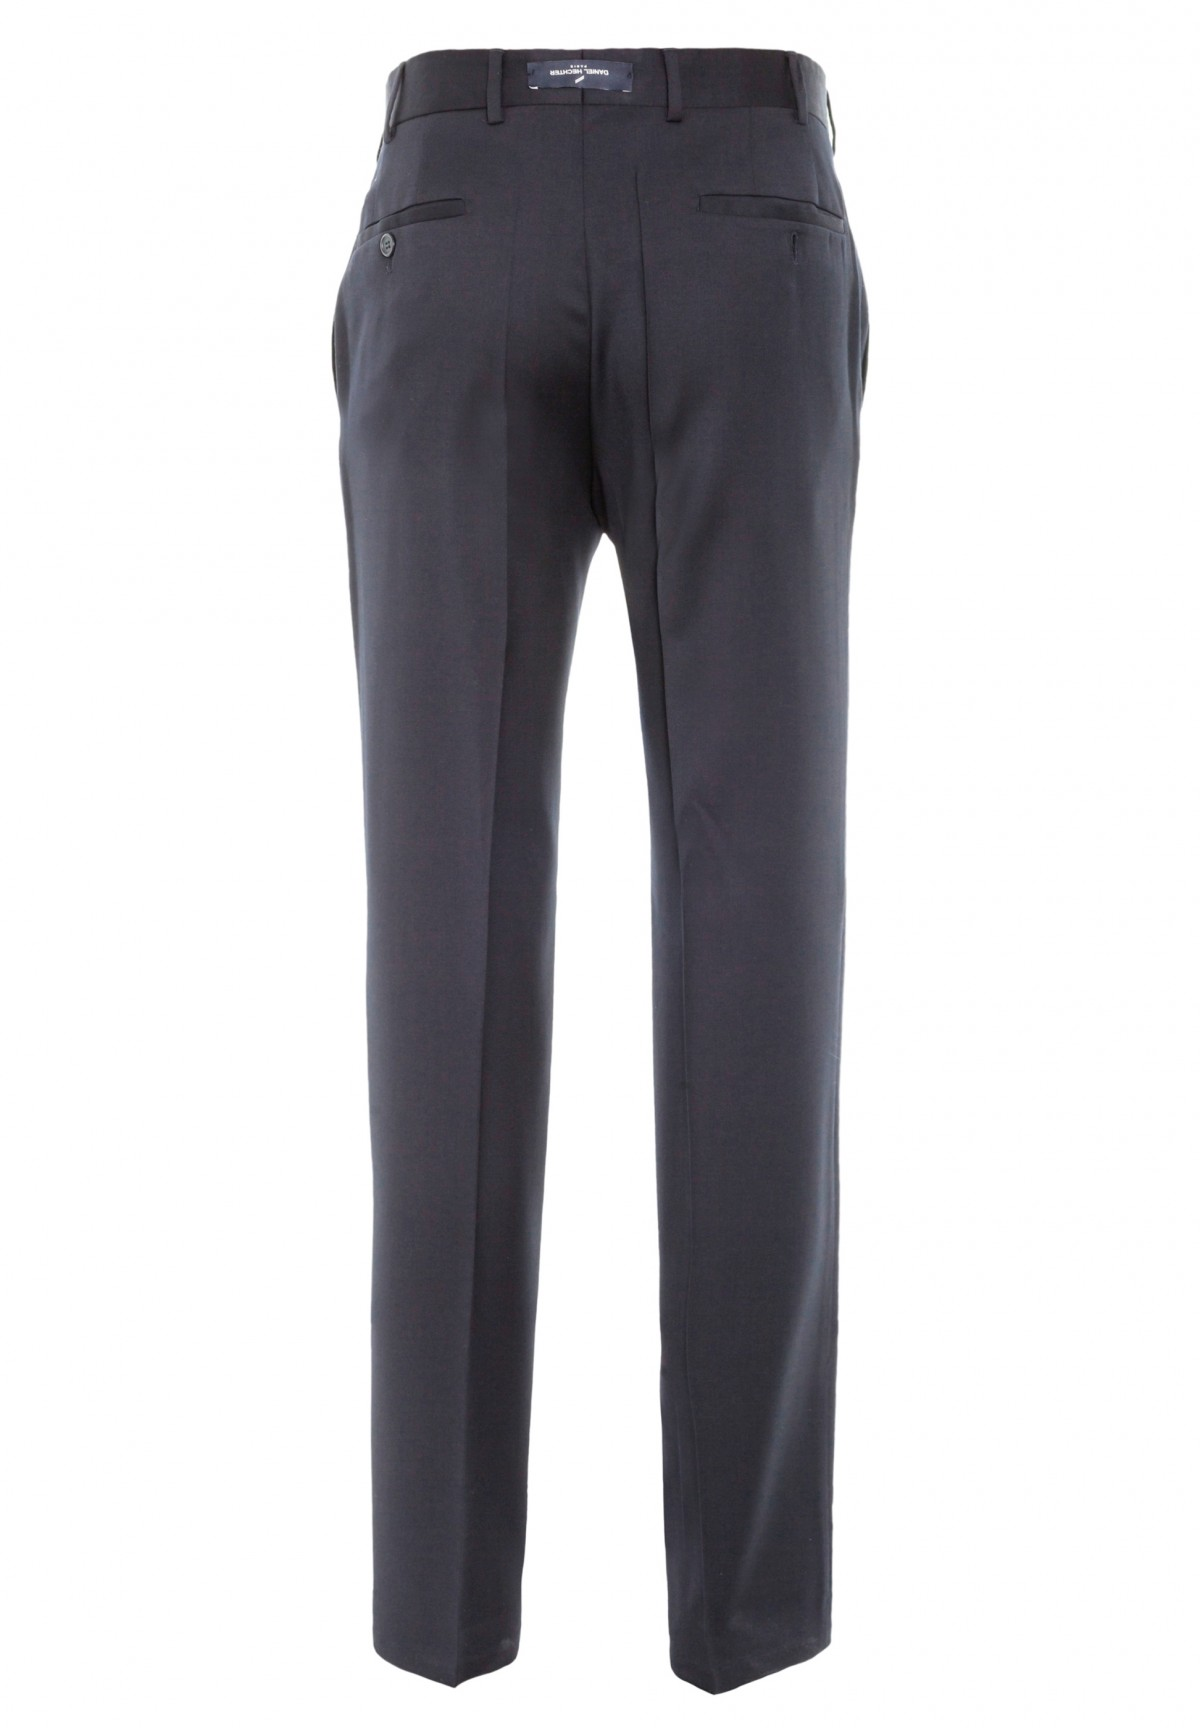 Mix & Match Pantalon, 5642-7951, Regular-Fit /